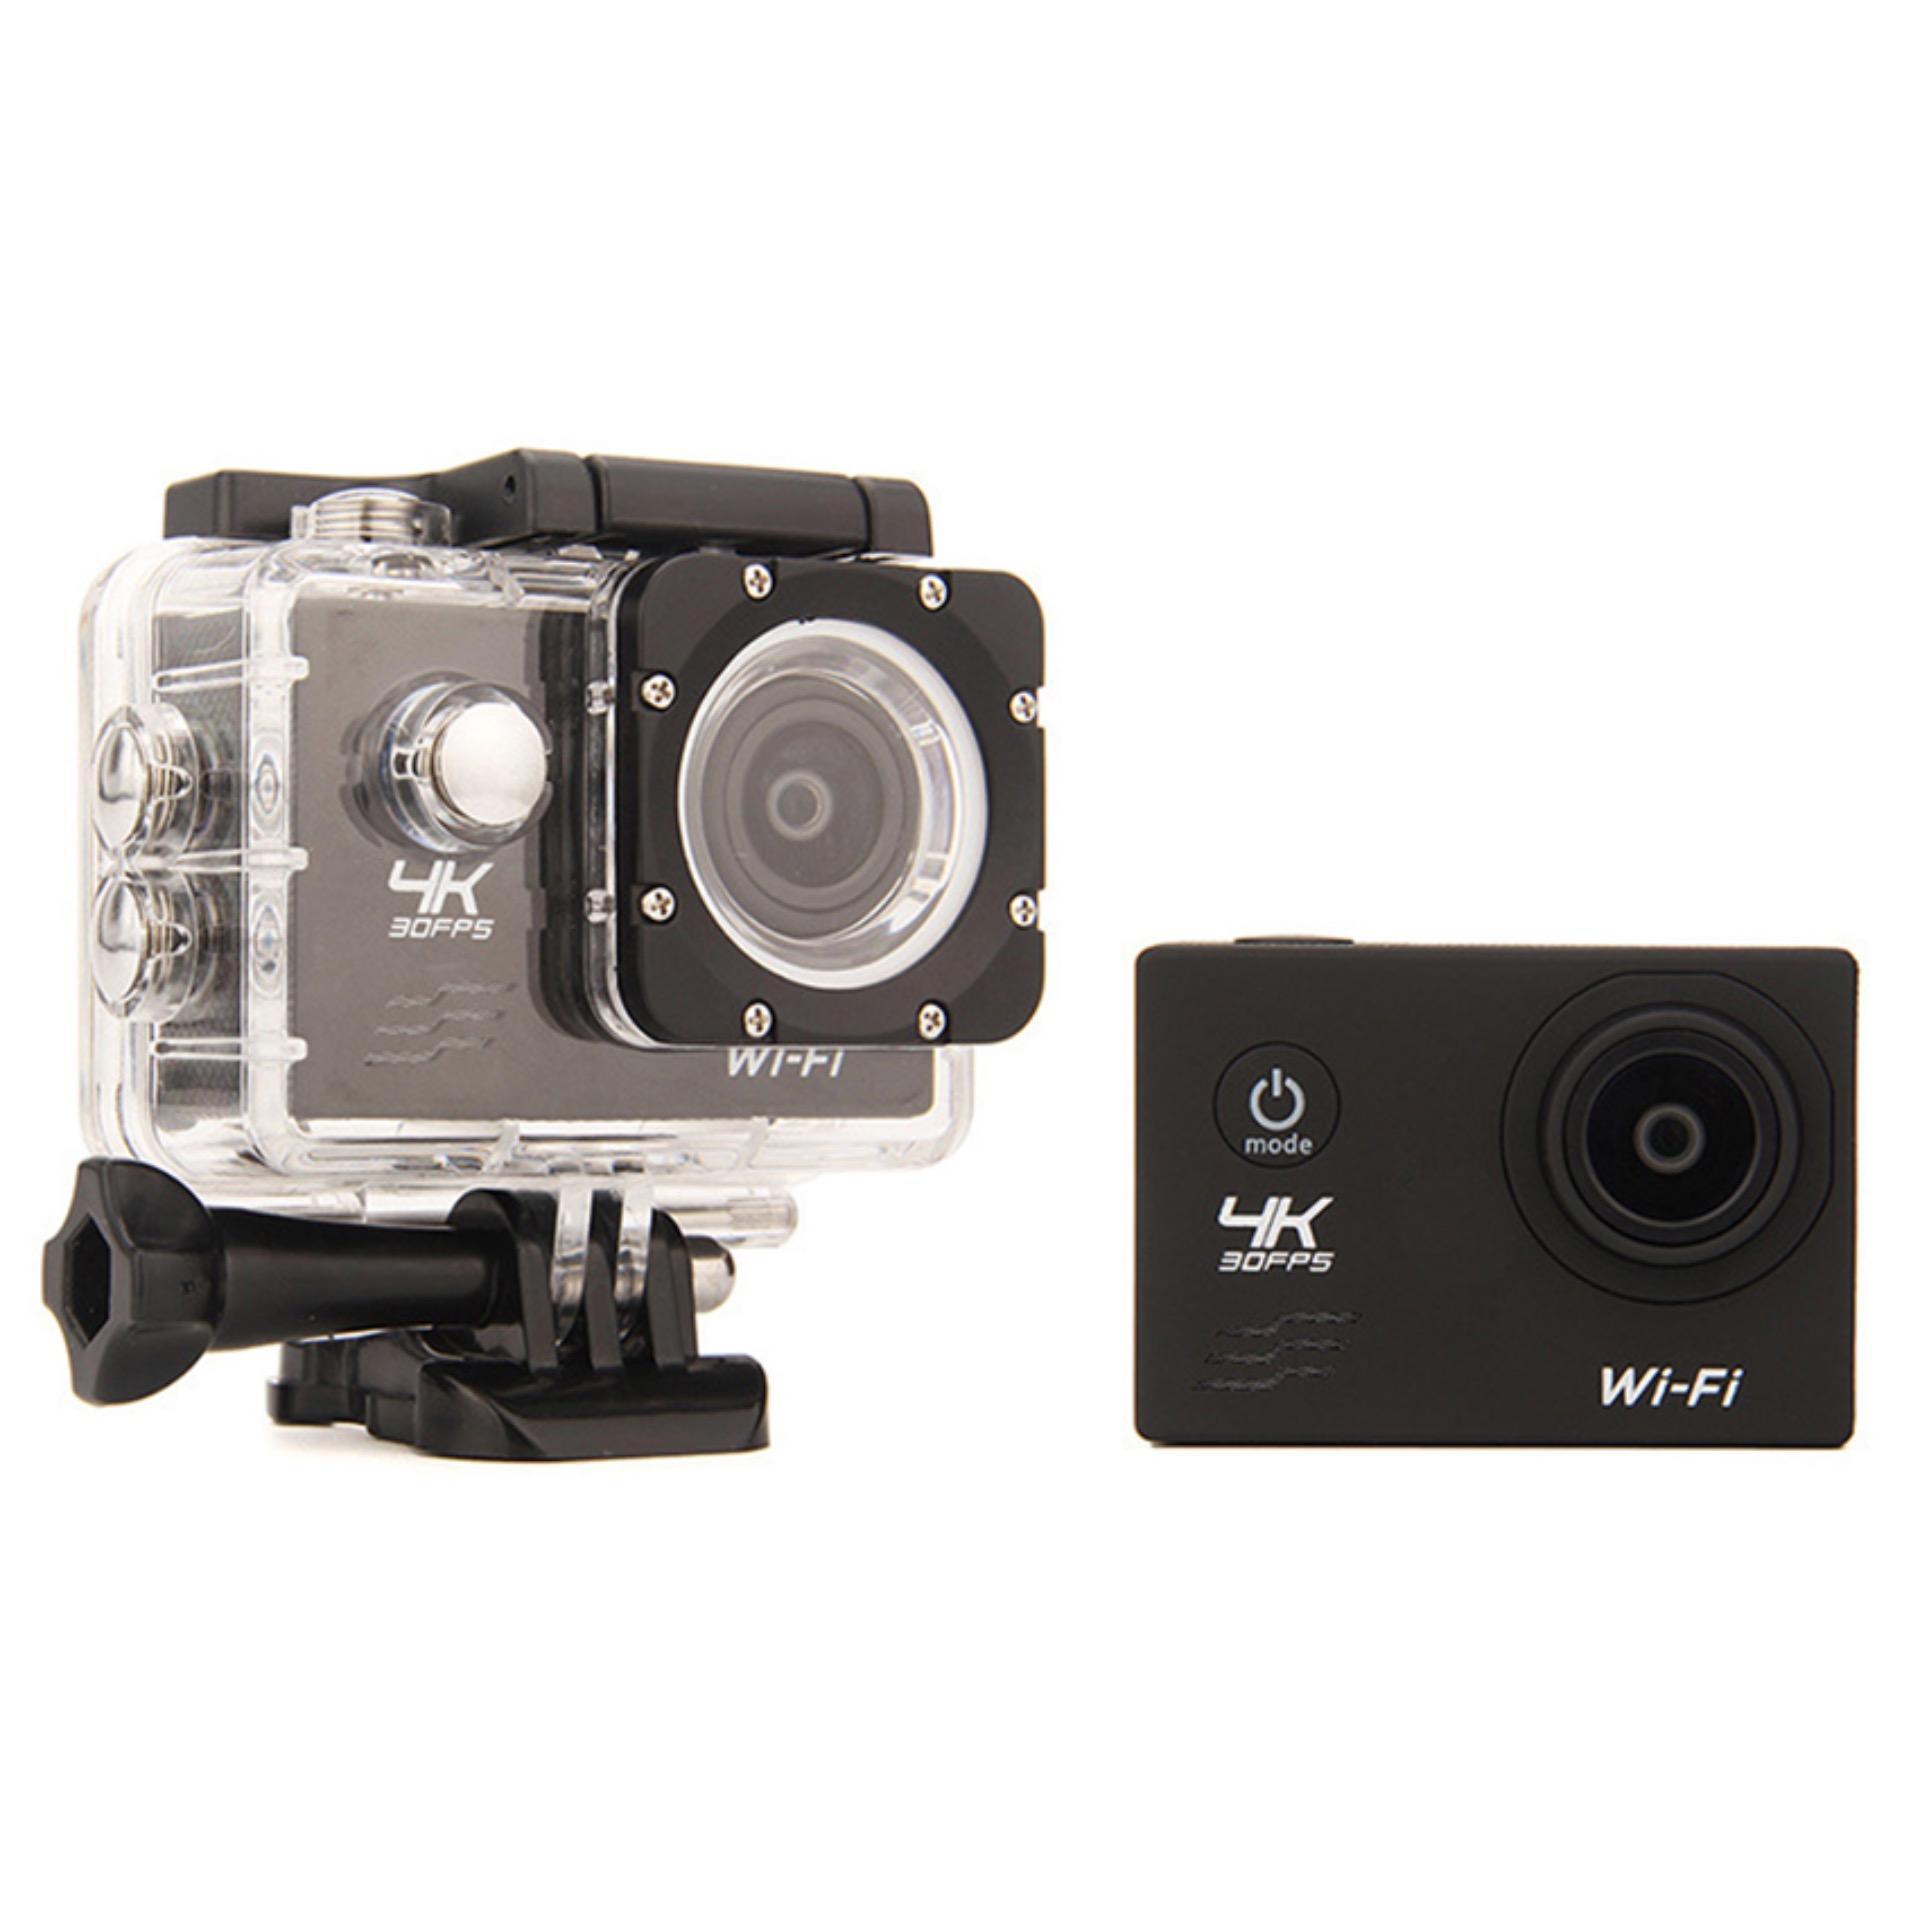 Ultra HD 4K WiFi 1080P Action camera DV Sport 2.0 LCD 170D lens go waterproof pro Hero Style camera Accessories